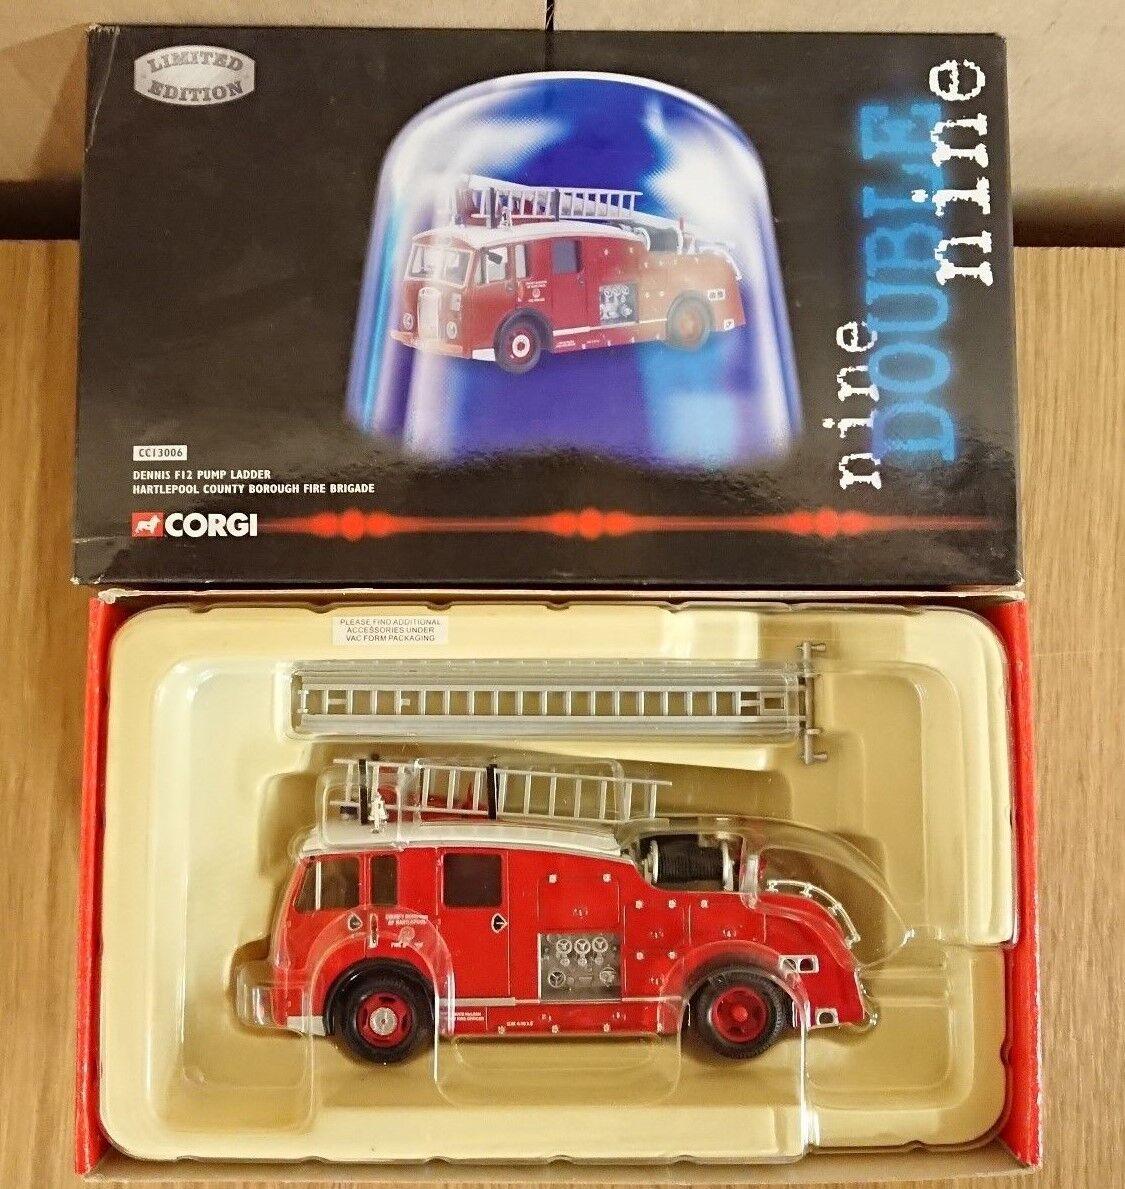 Corgi 999 CC13006 Dennis F12 Pump Ladder Hartlepool Ltd Ed. No. 0003 of 1700